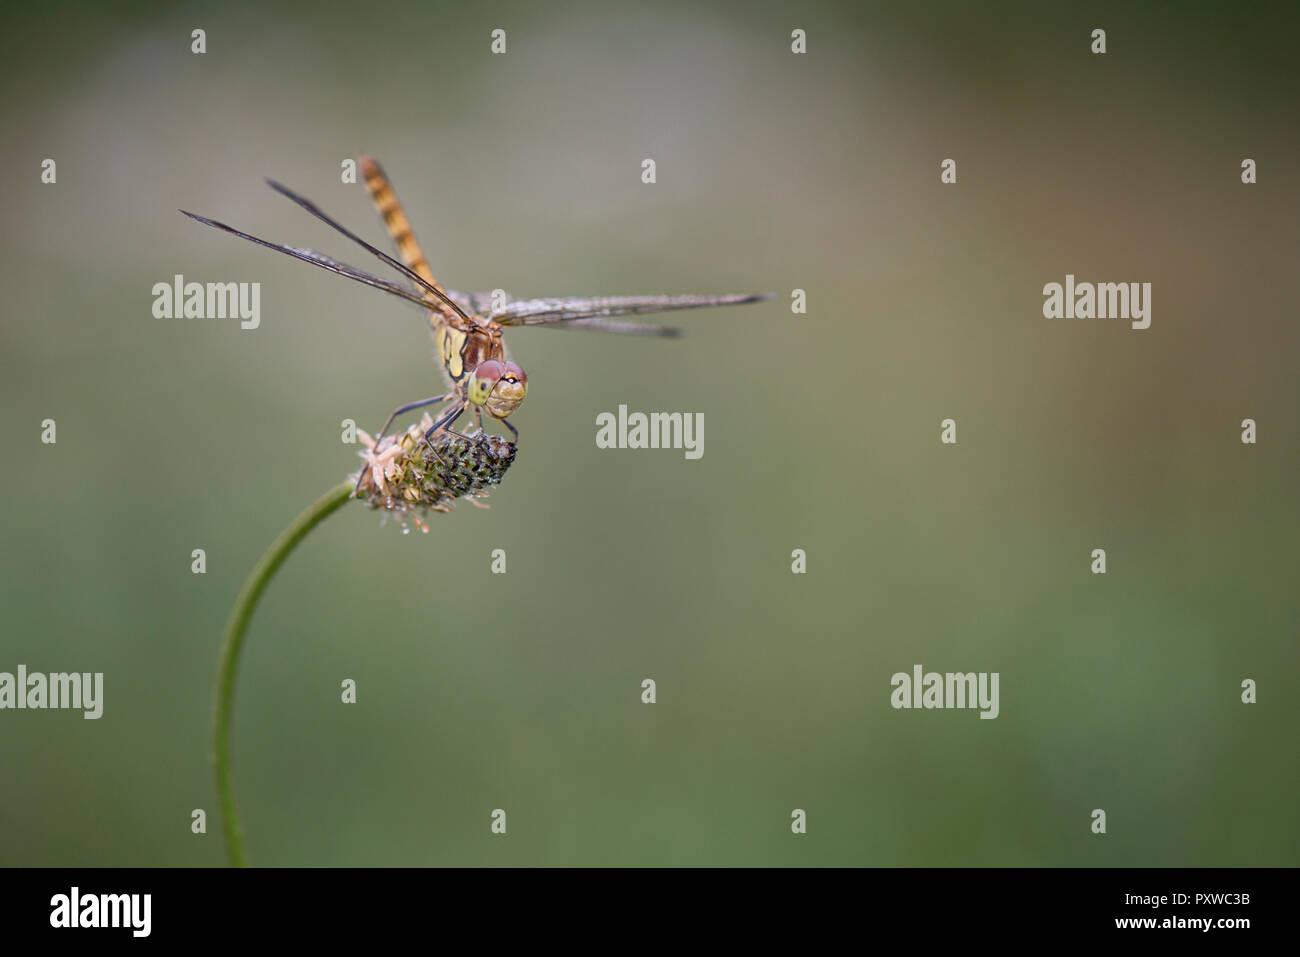 Common darter firefly, Sympetrum striolatum, hovering over flower Stock Photo